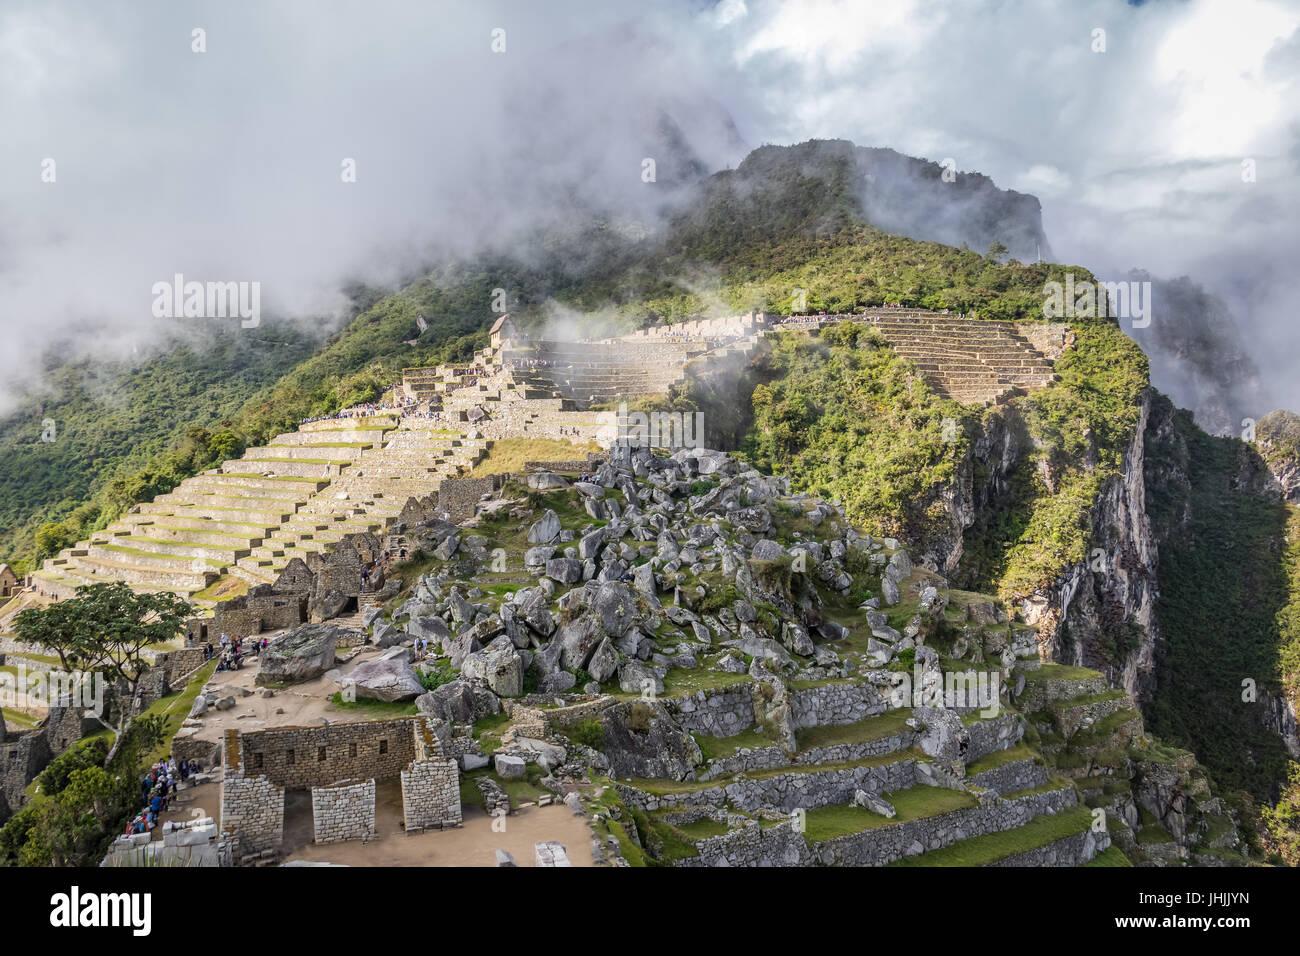 Terrassen am Inkaruinen Machu Picchu - Heiliges Tal, Peru Stockbild